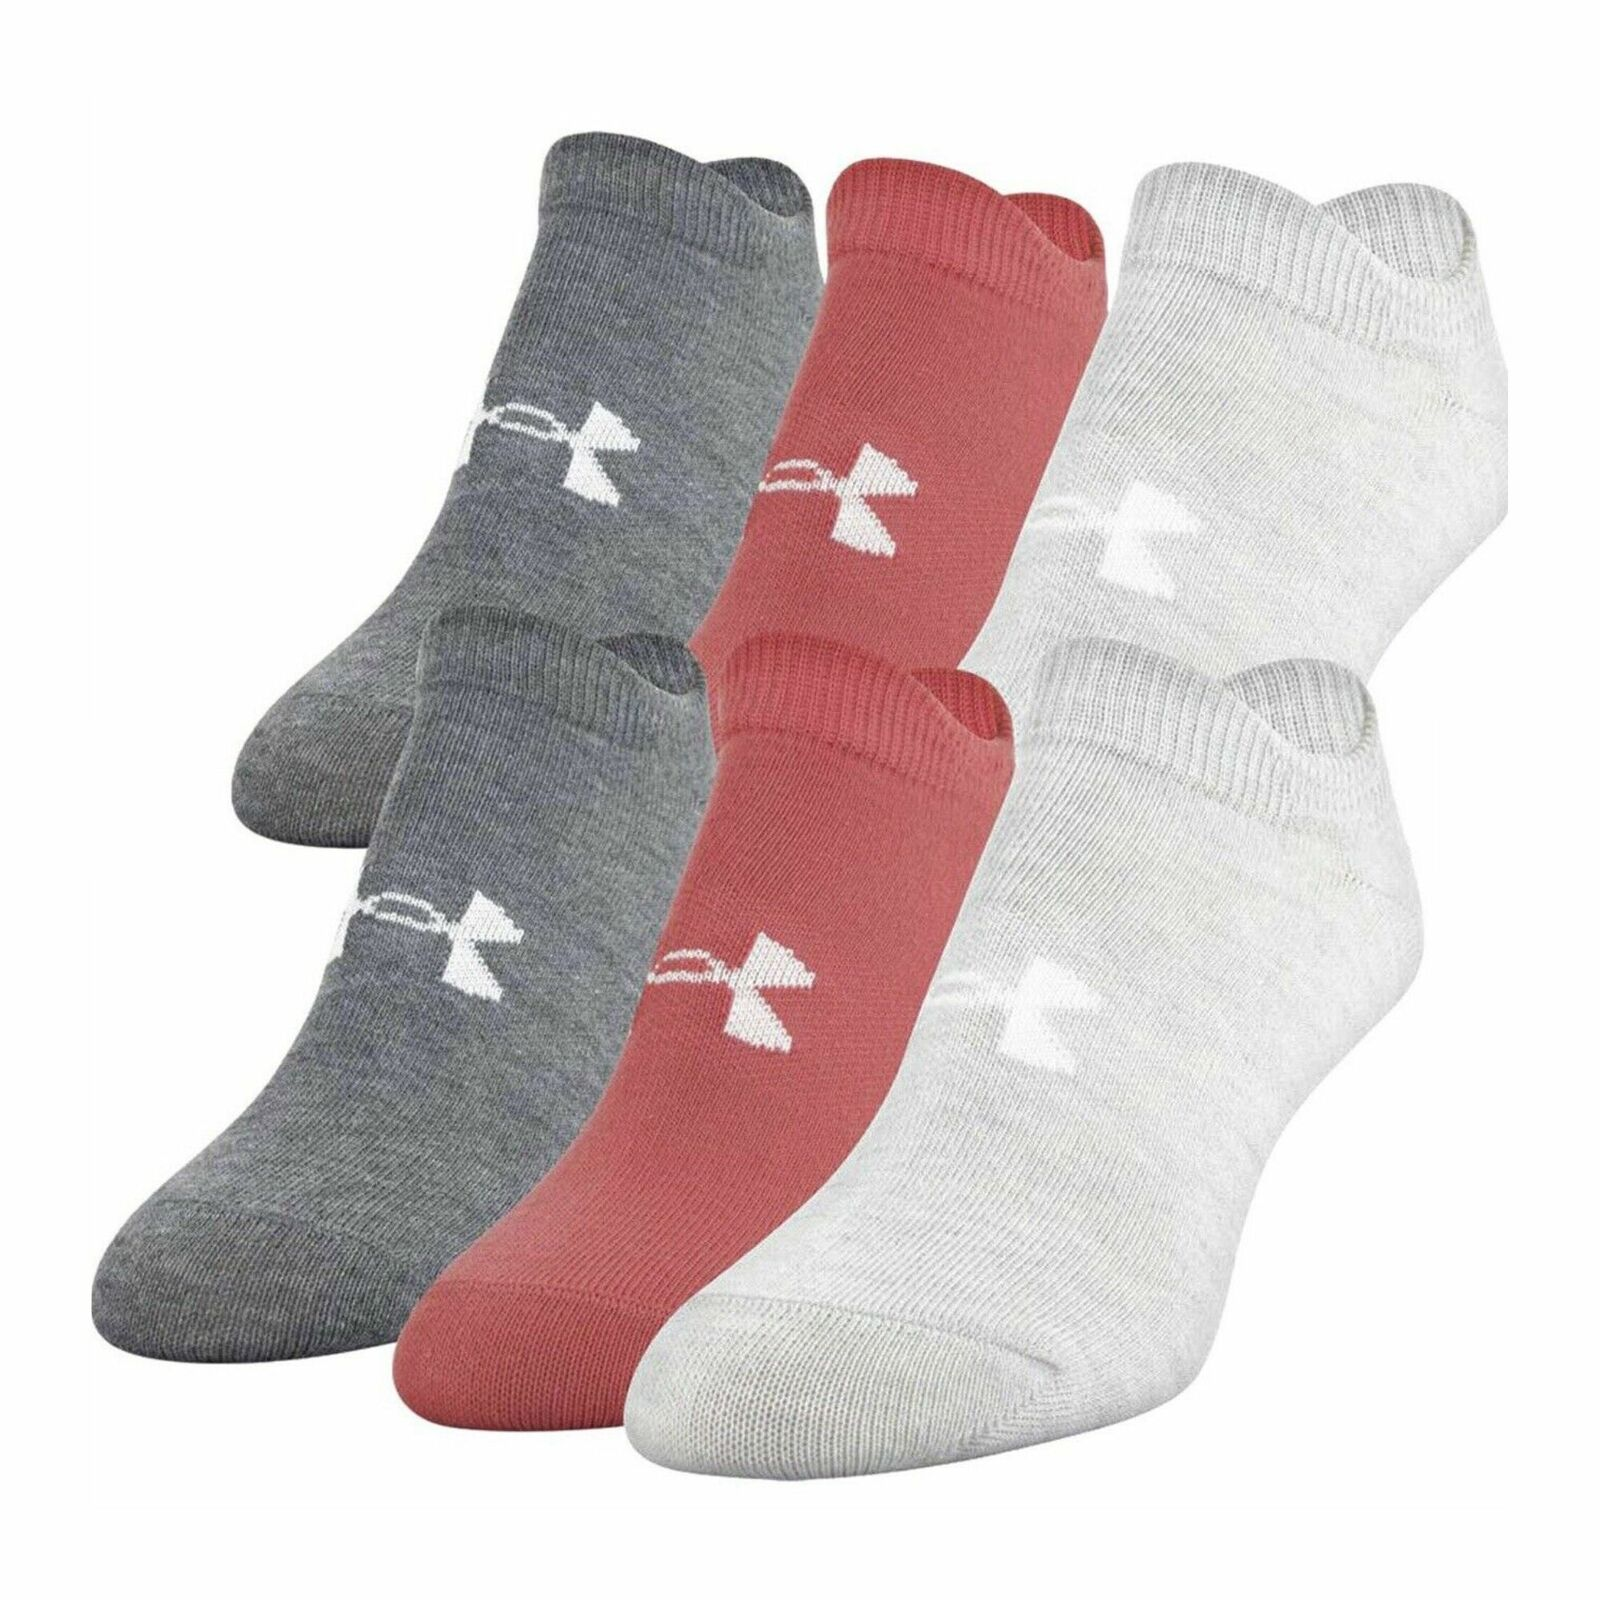 (6 Pair) Under Armour Womens Heather Assorted Essential No-Show Socks Sz 6-9